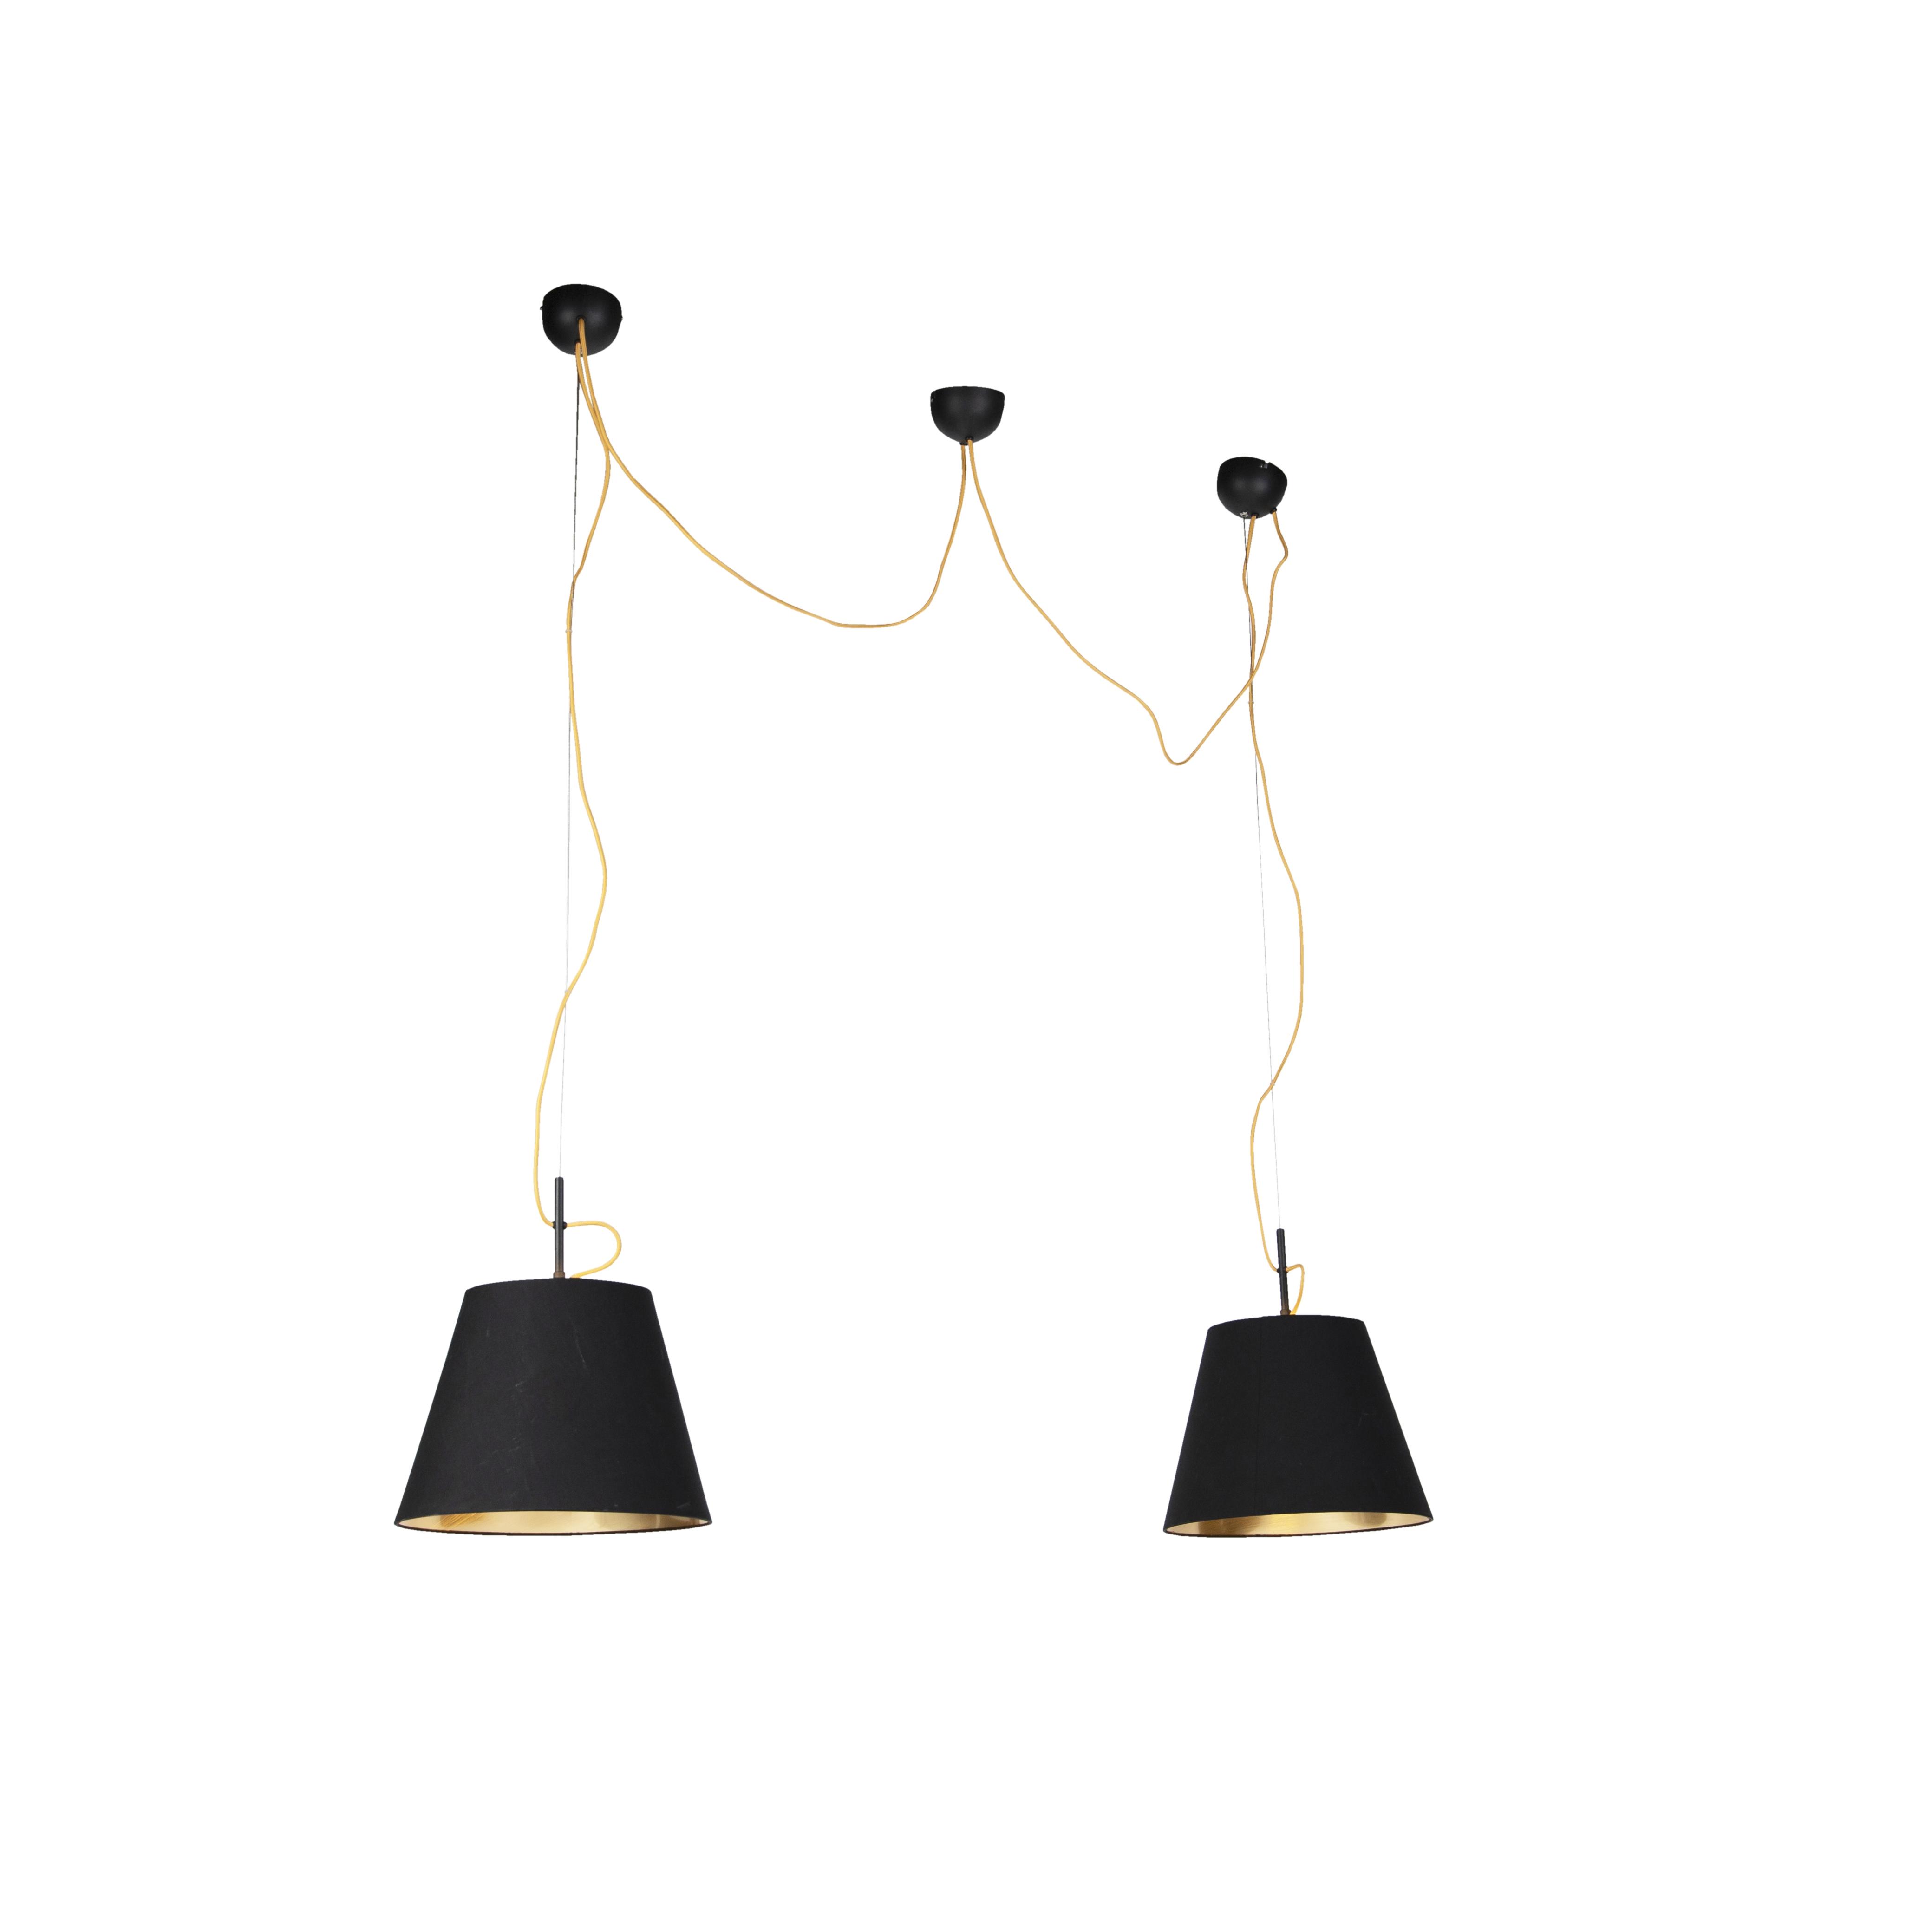 Moderne hanglamp zwart gouden binnenkant 2-lichts - Andrie